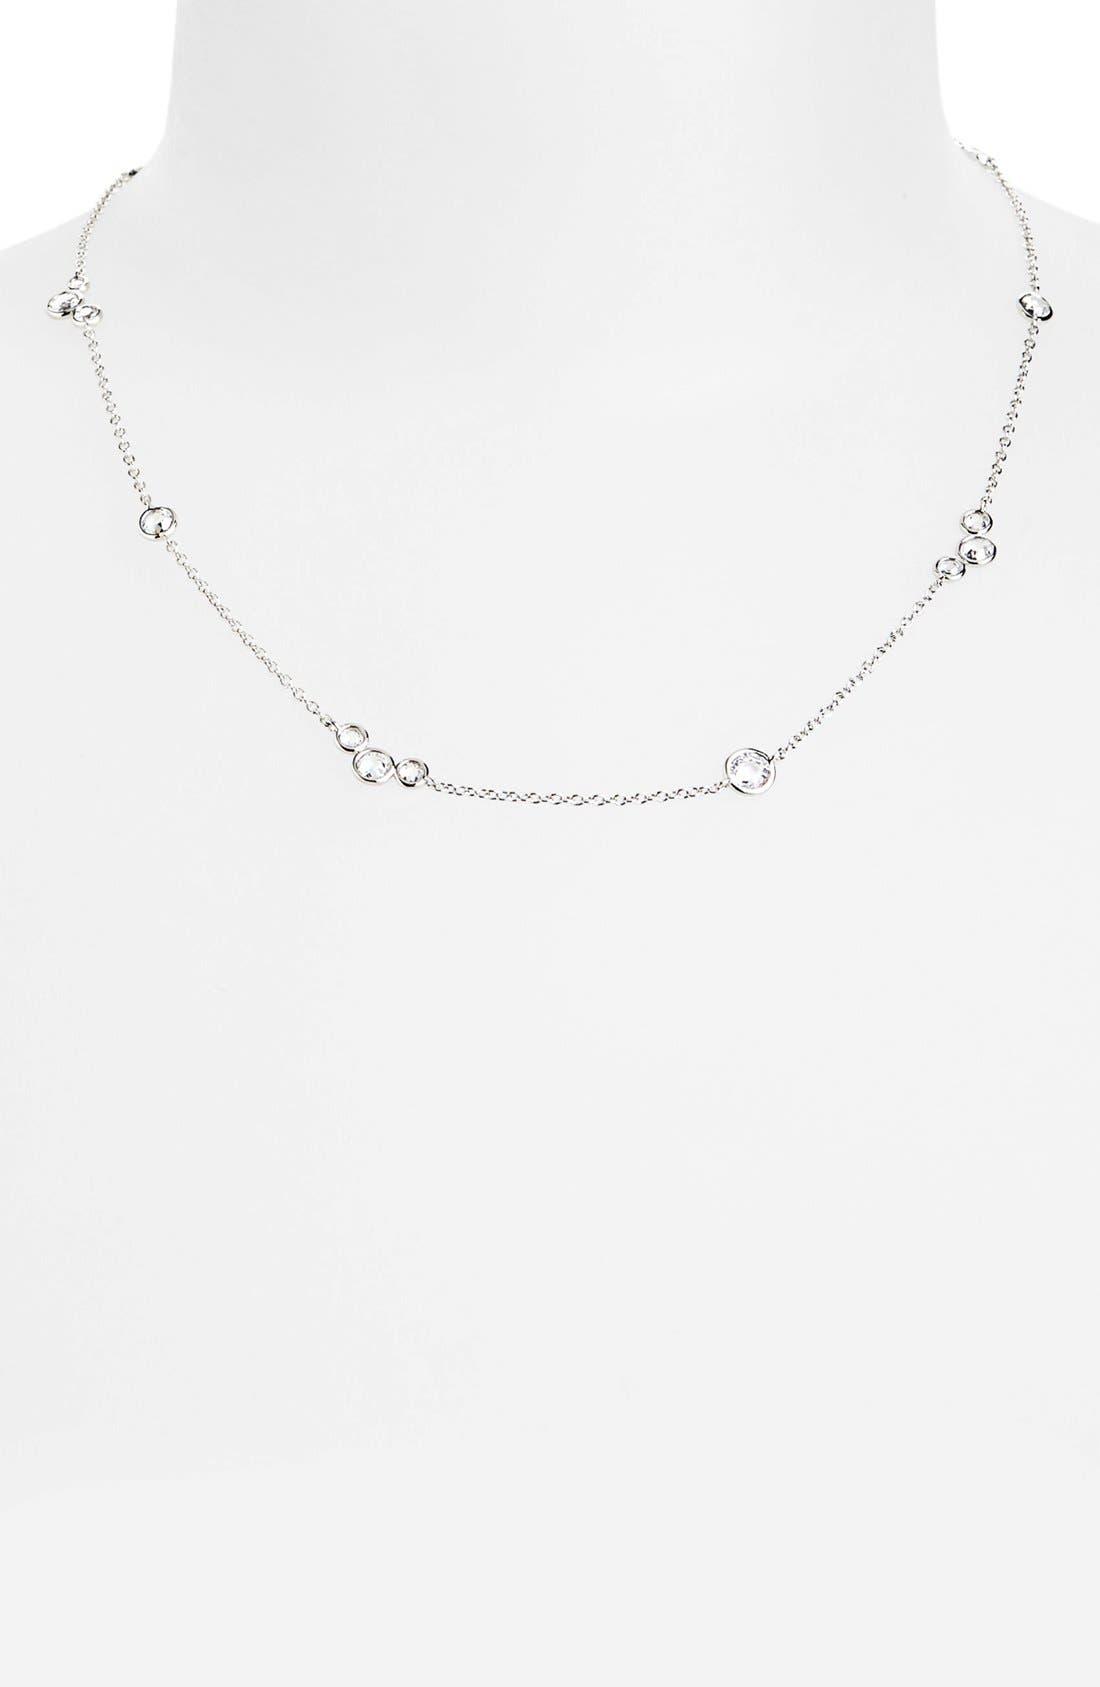 Main Image - Nadri 'Dewdrop' Station Collar Necklace